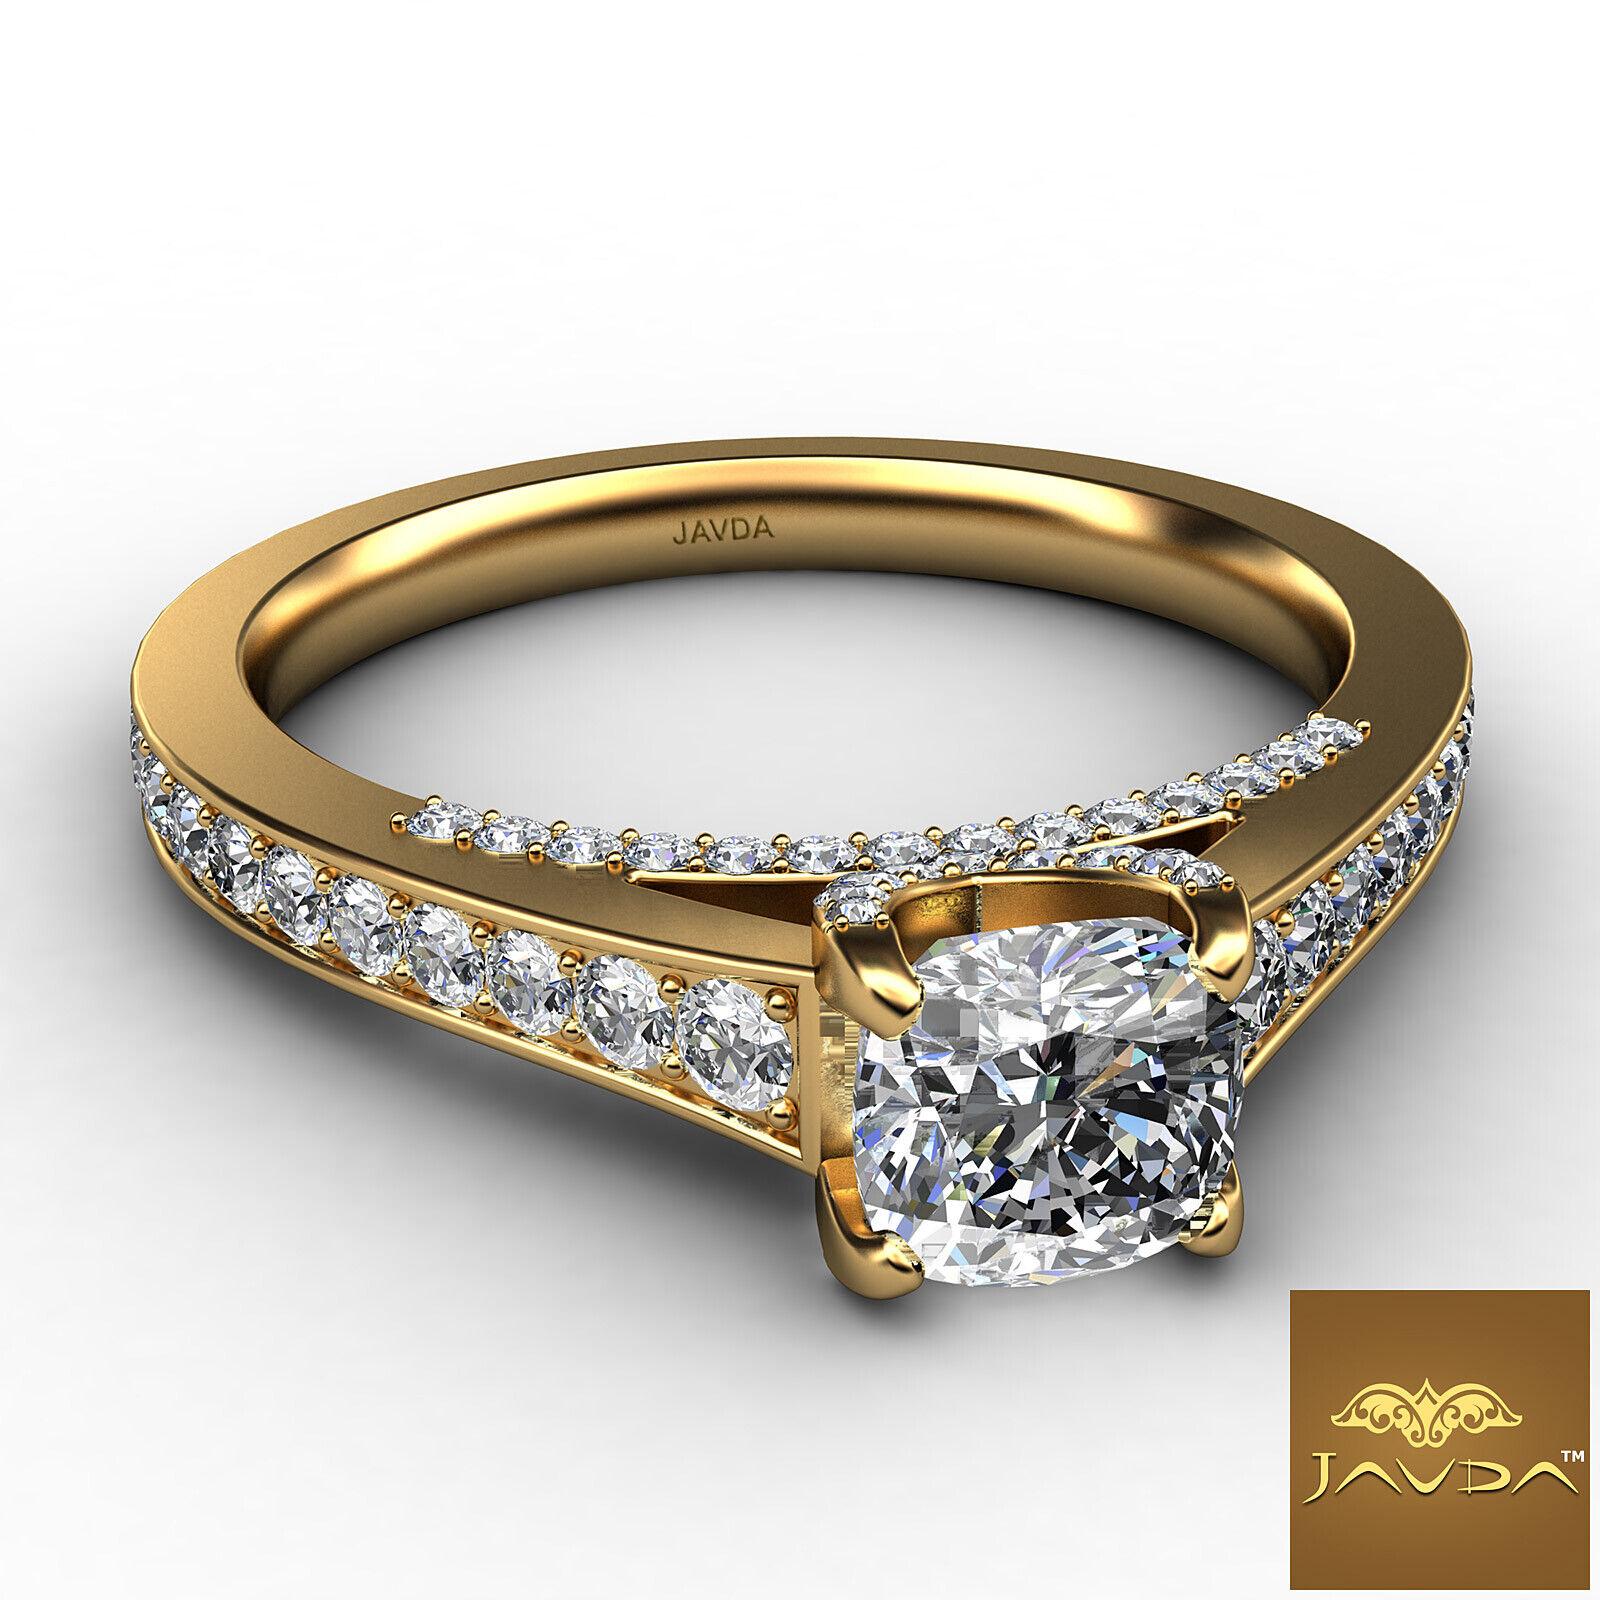 Cushion Cut Diamond Flawless Engagement GIA G VVS2 Pave Set Ring Platinum 1.25Ct 5